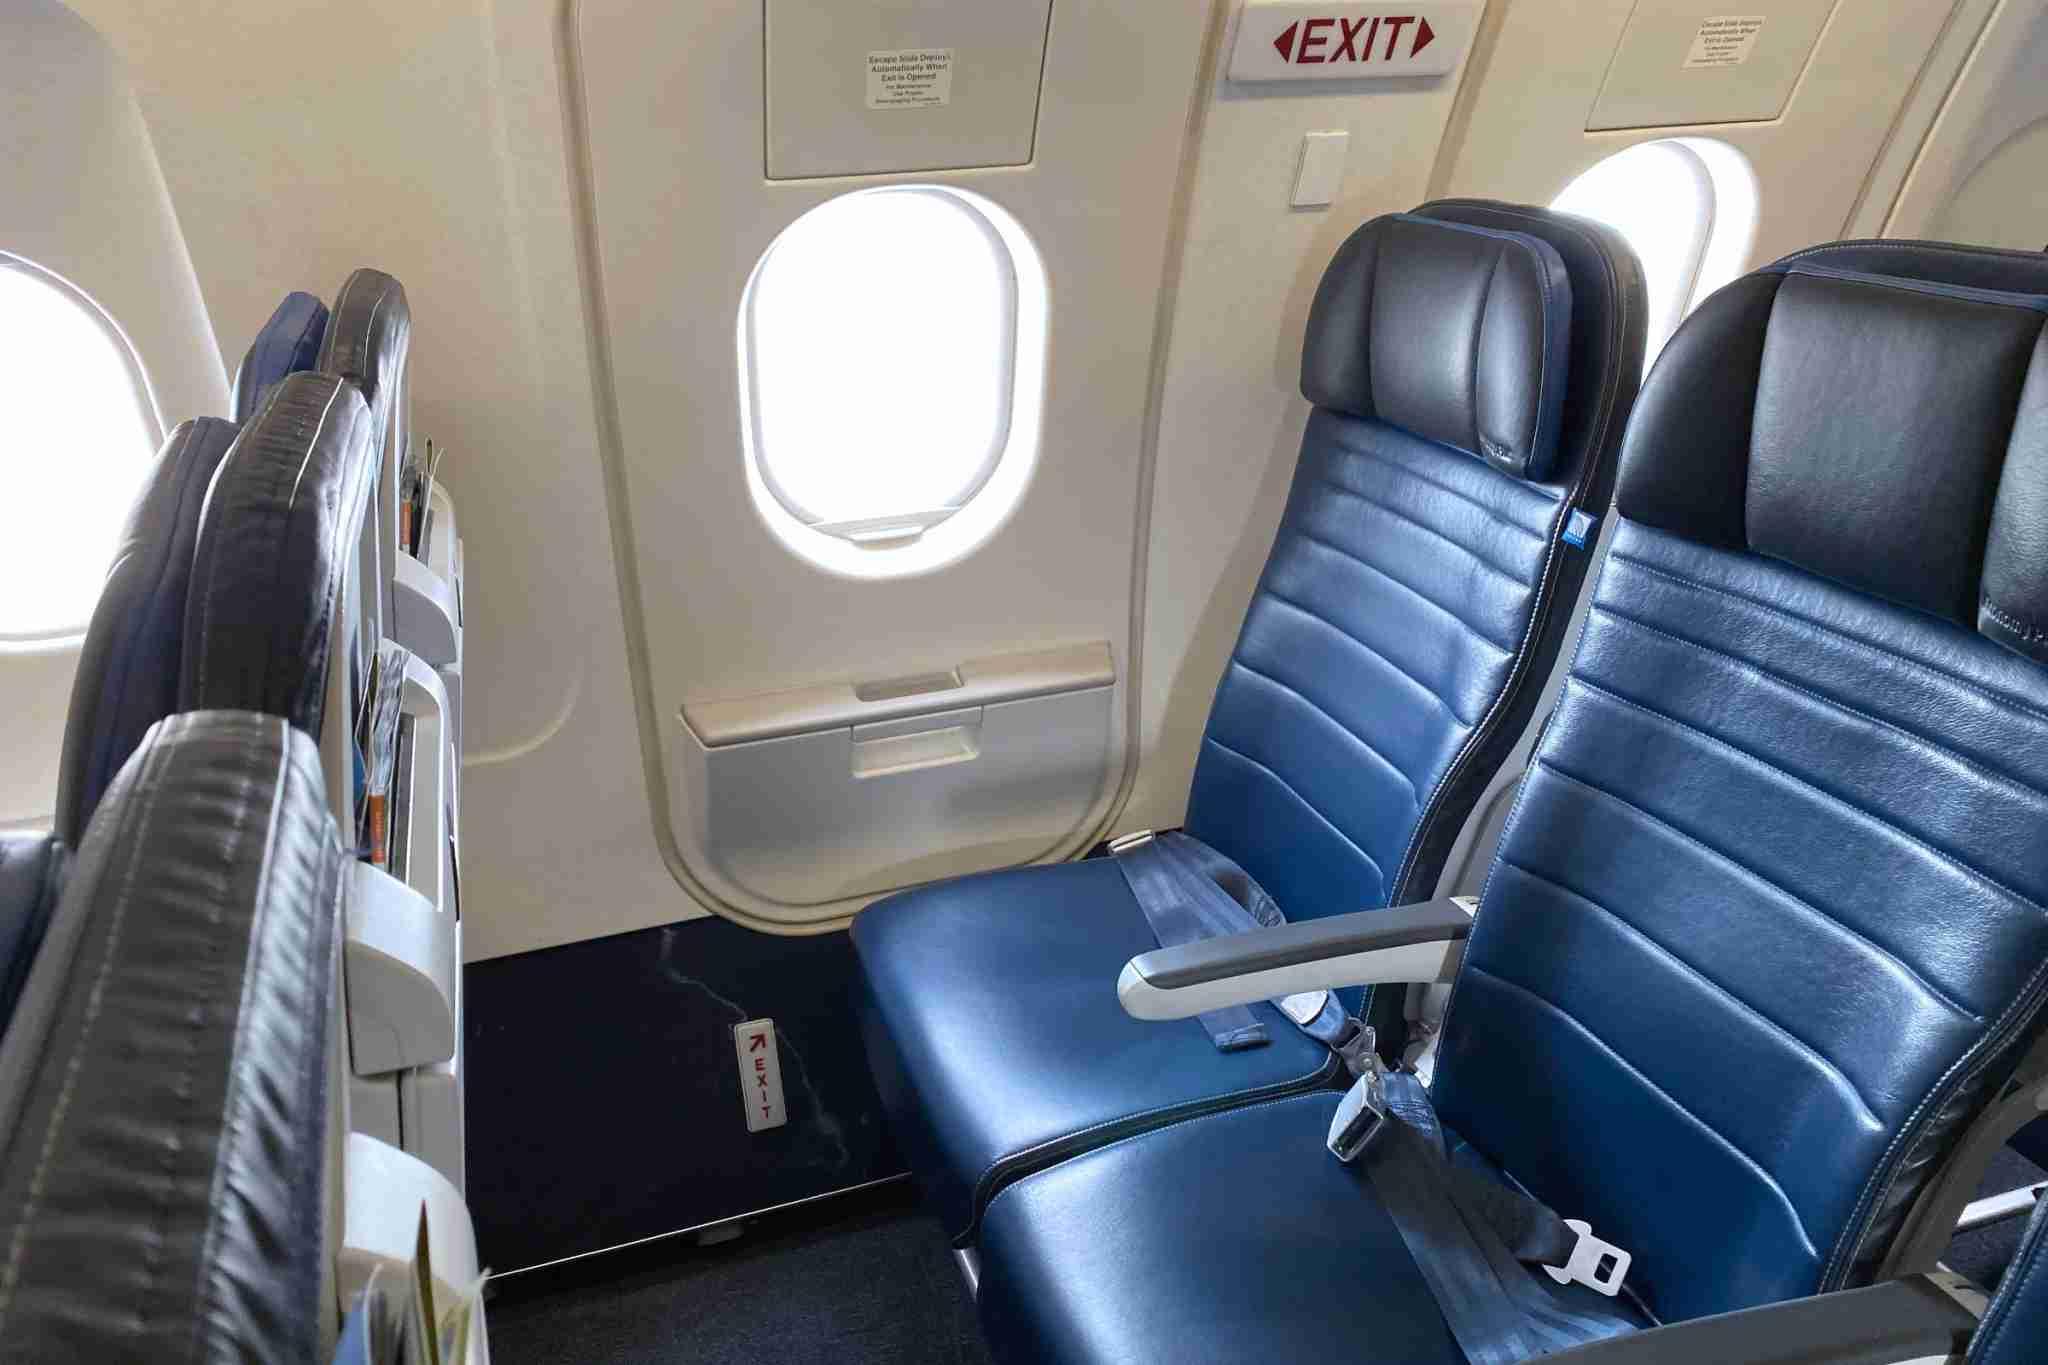 Lock in extra-legroom seats with your elite benefits